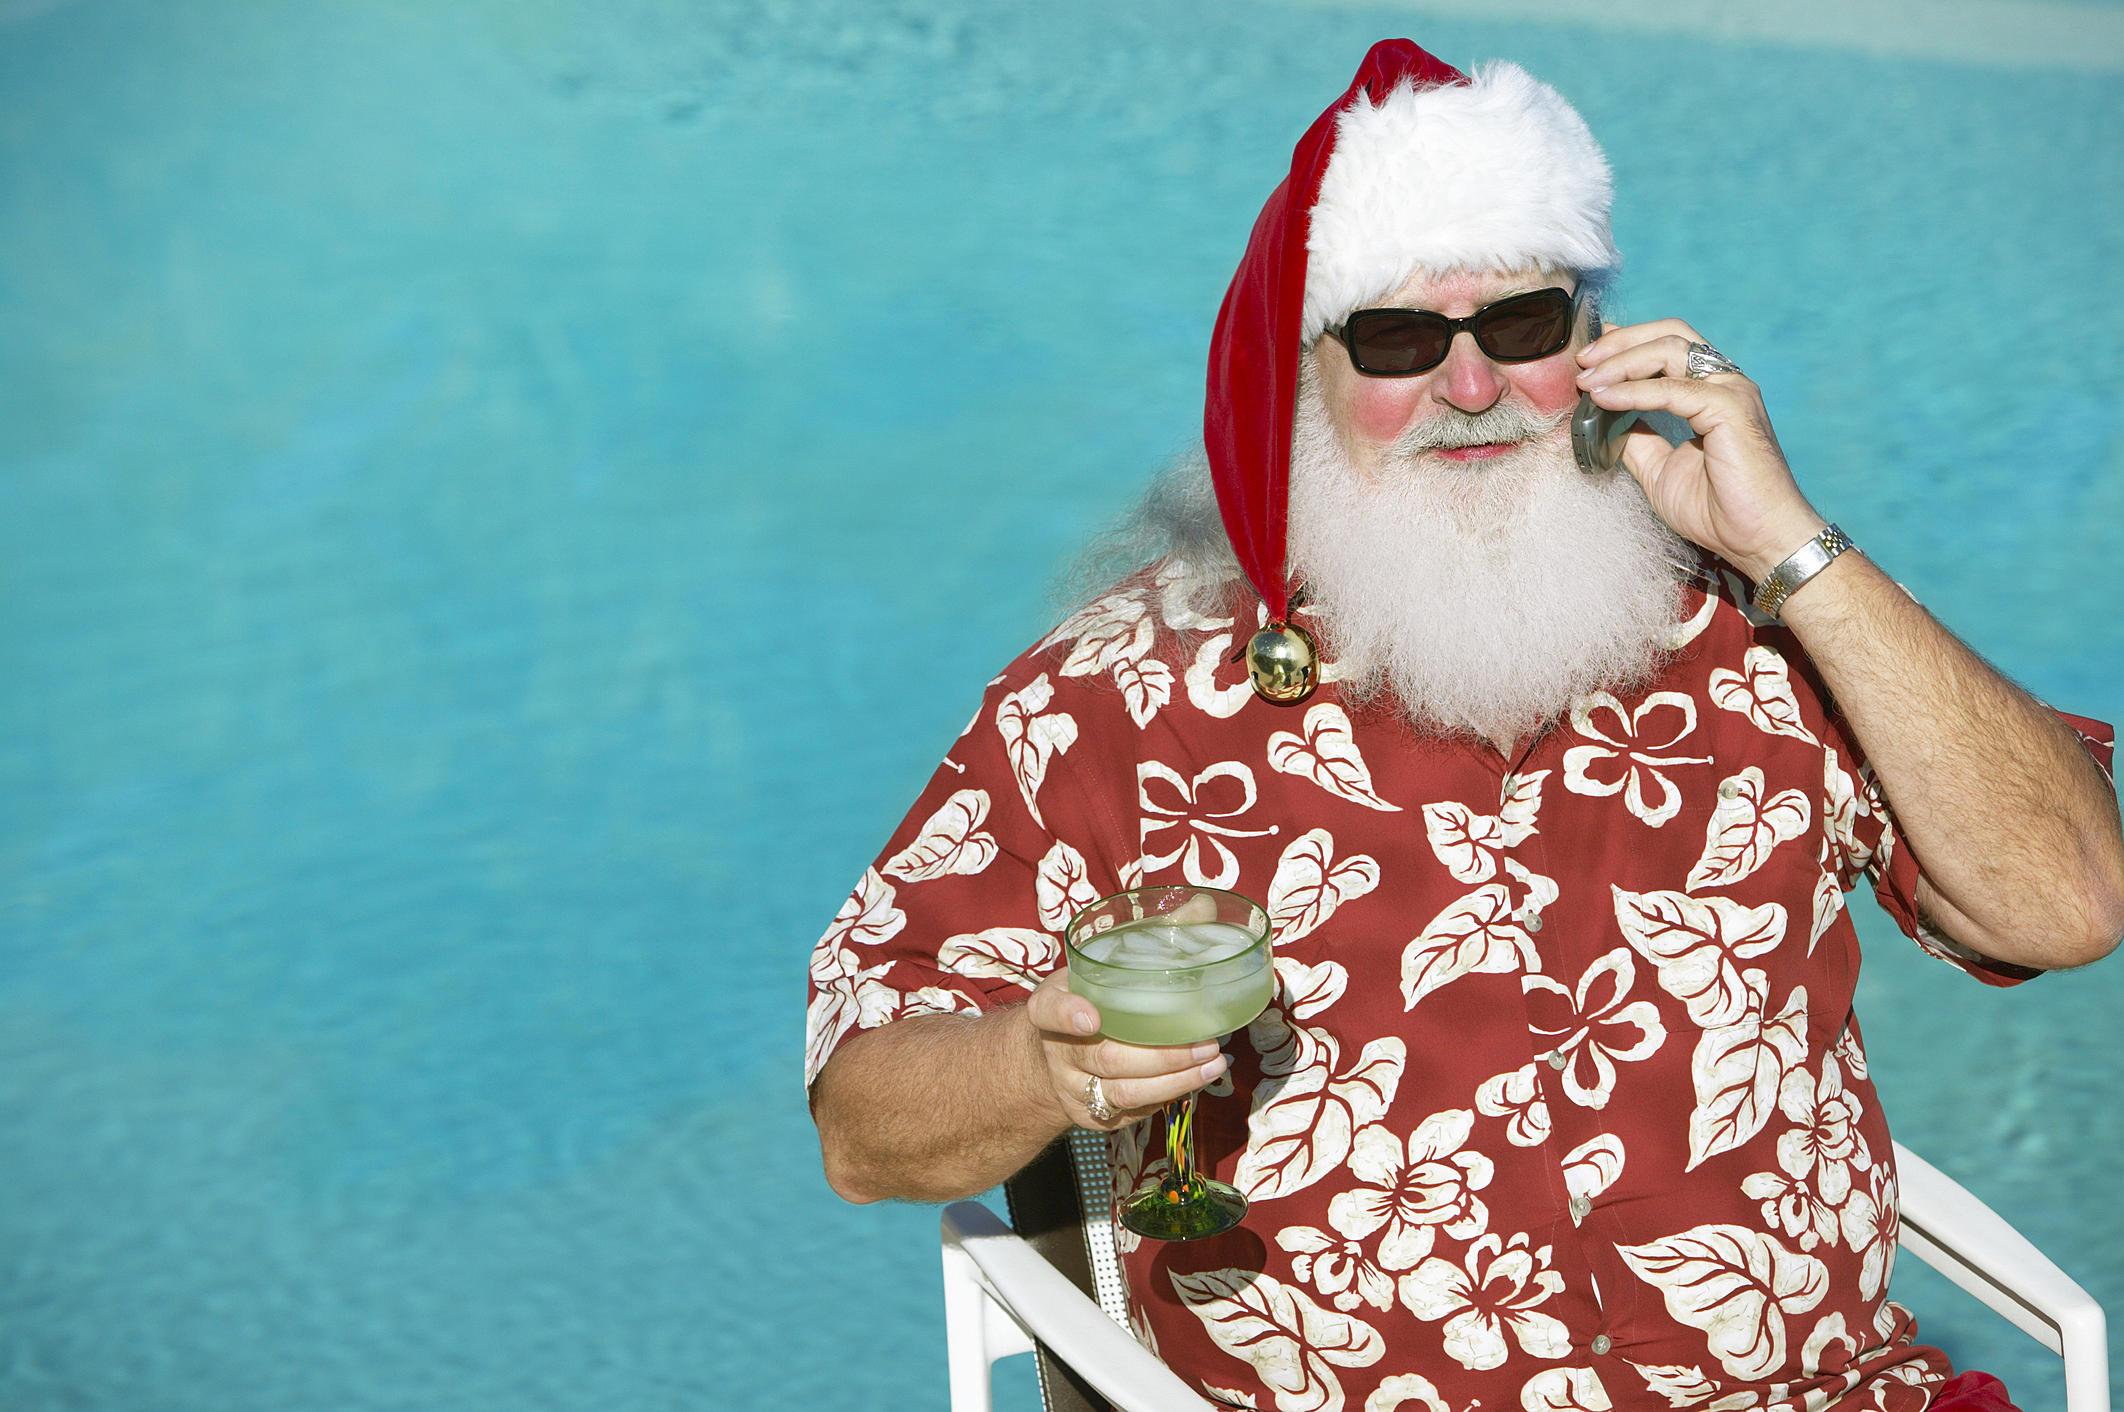 TRI 102.5 Brings You A \'Christmas in July\' Weekend\'